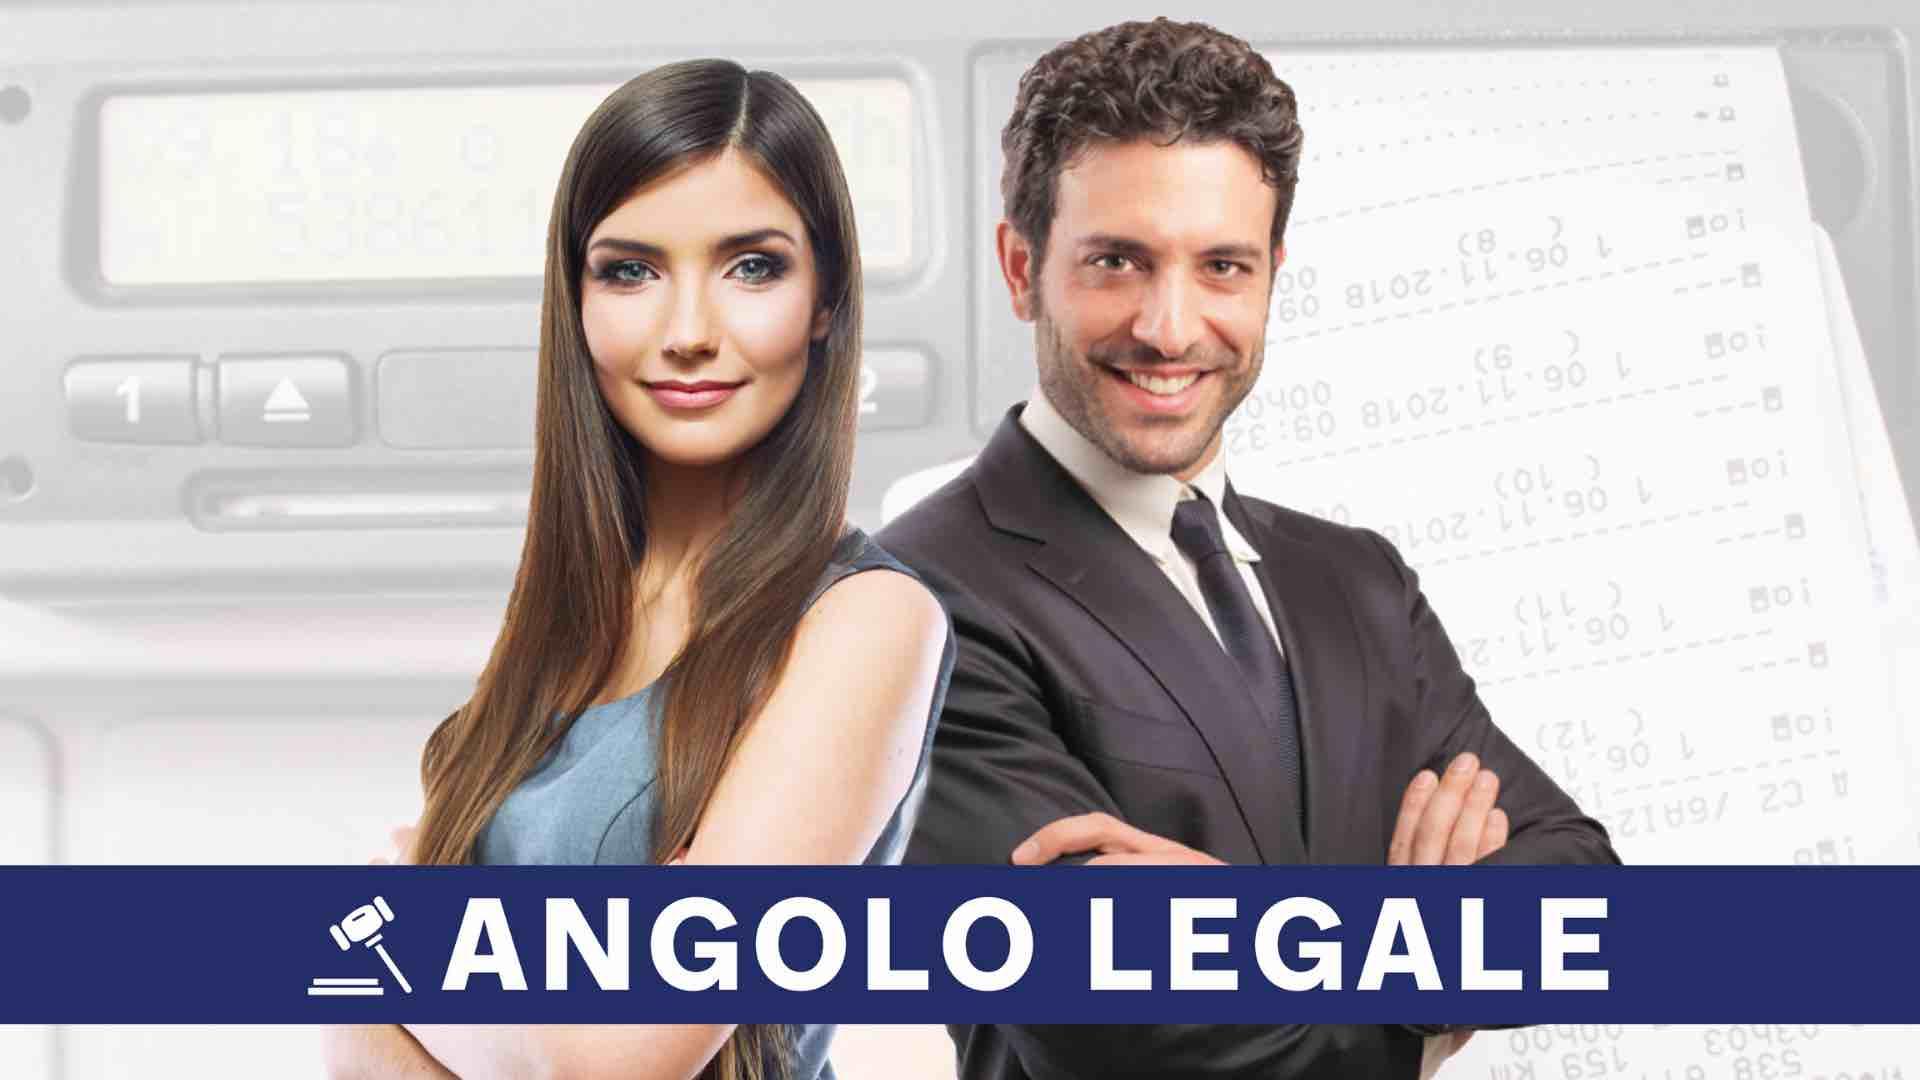 Copy of ANGOLO LEGALE 2